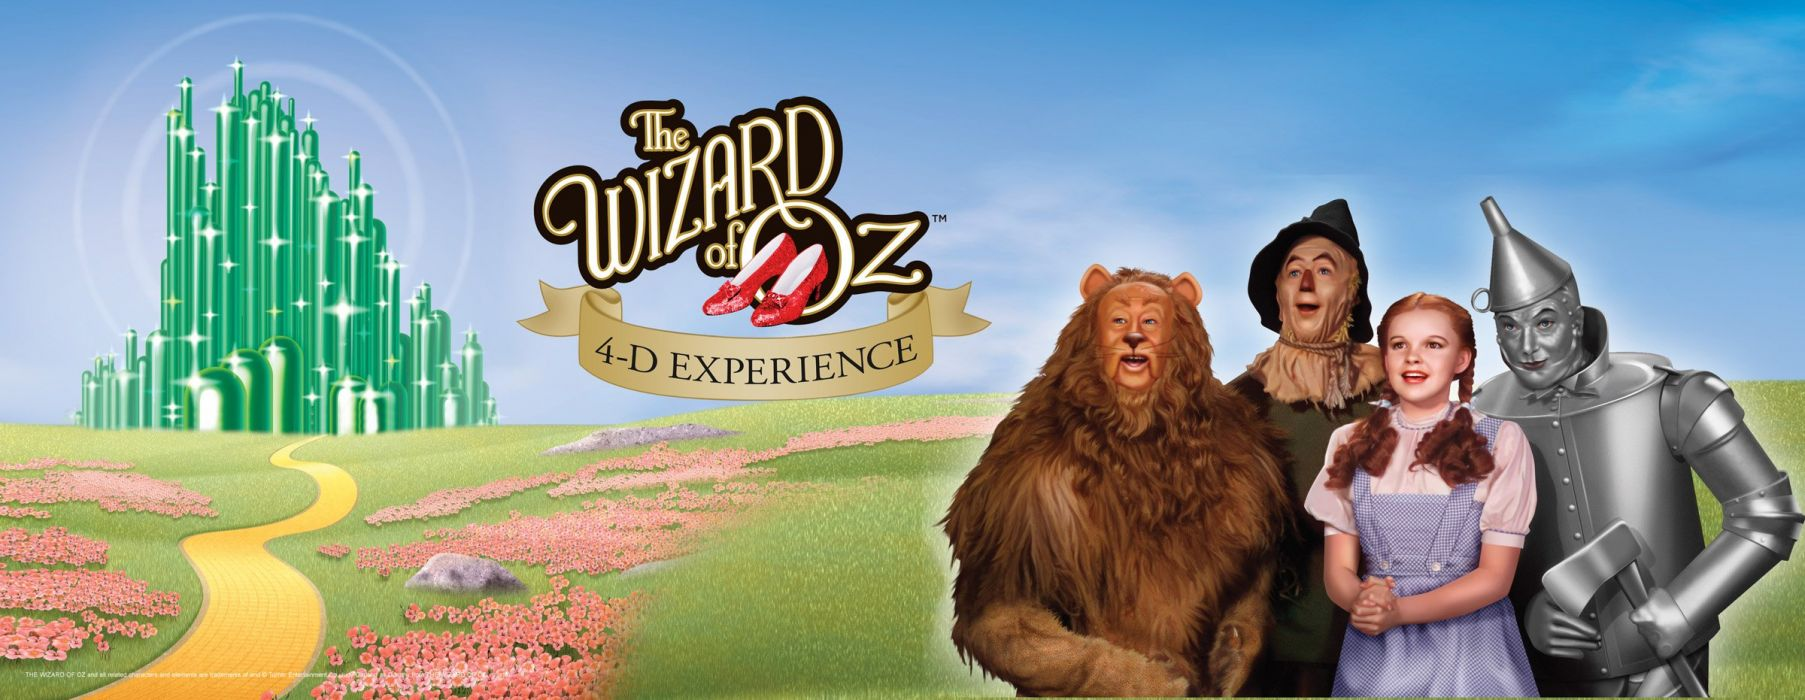 WIZARD OF O-Z adventure family fantasy movie film wizard-of-oz (38) wallpaper